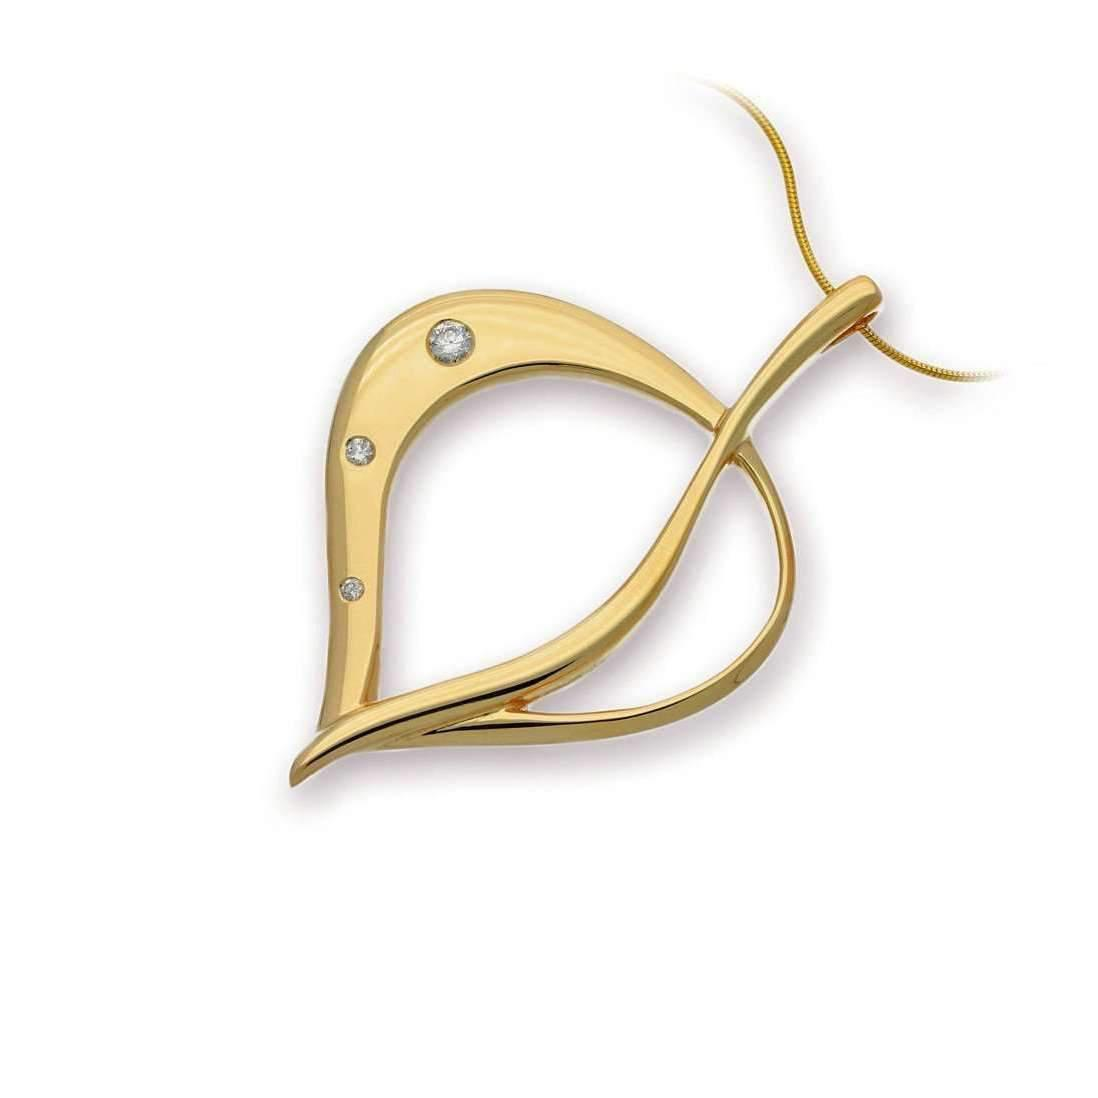 Ortak Leah Shadow Gold Earrings with Diamonds c3gI5dx